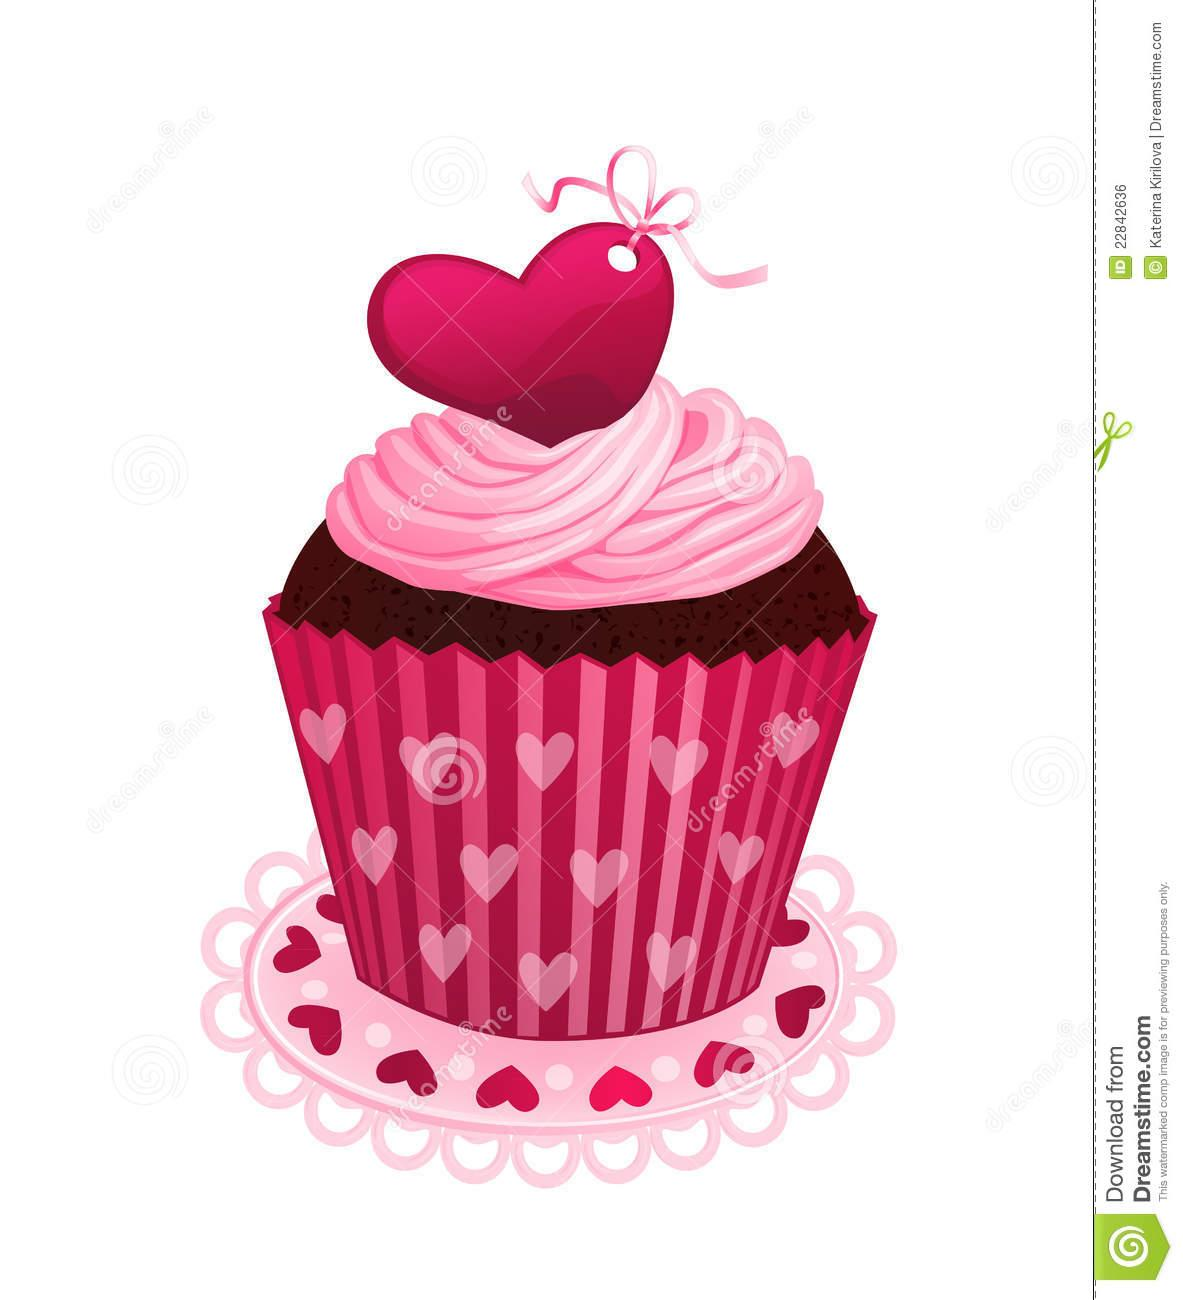 Valentine Day Cupcake Royalty Free Stock Image Image ... (1183 x 1300 Pixel)